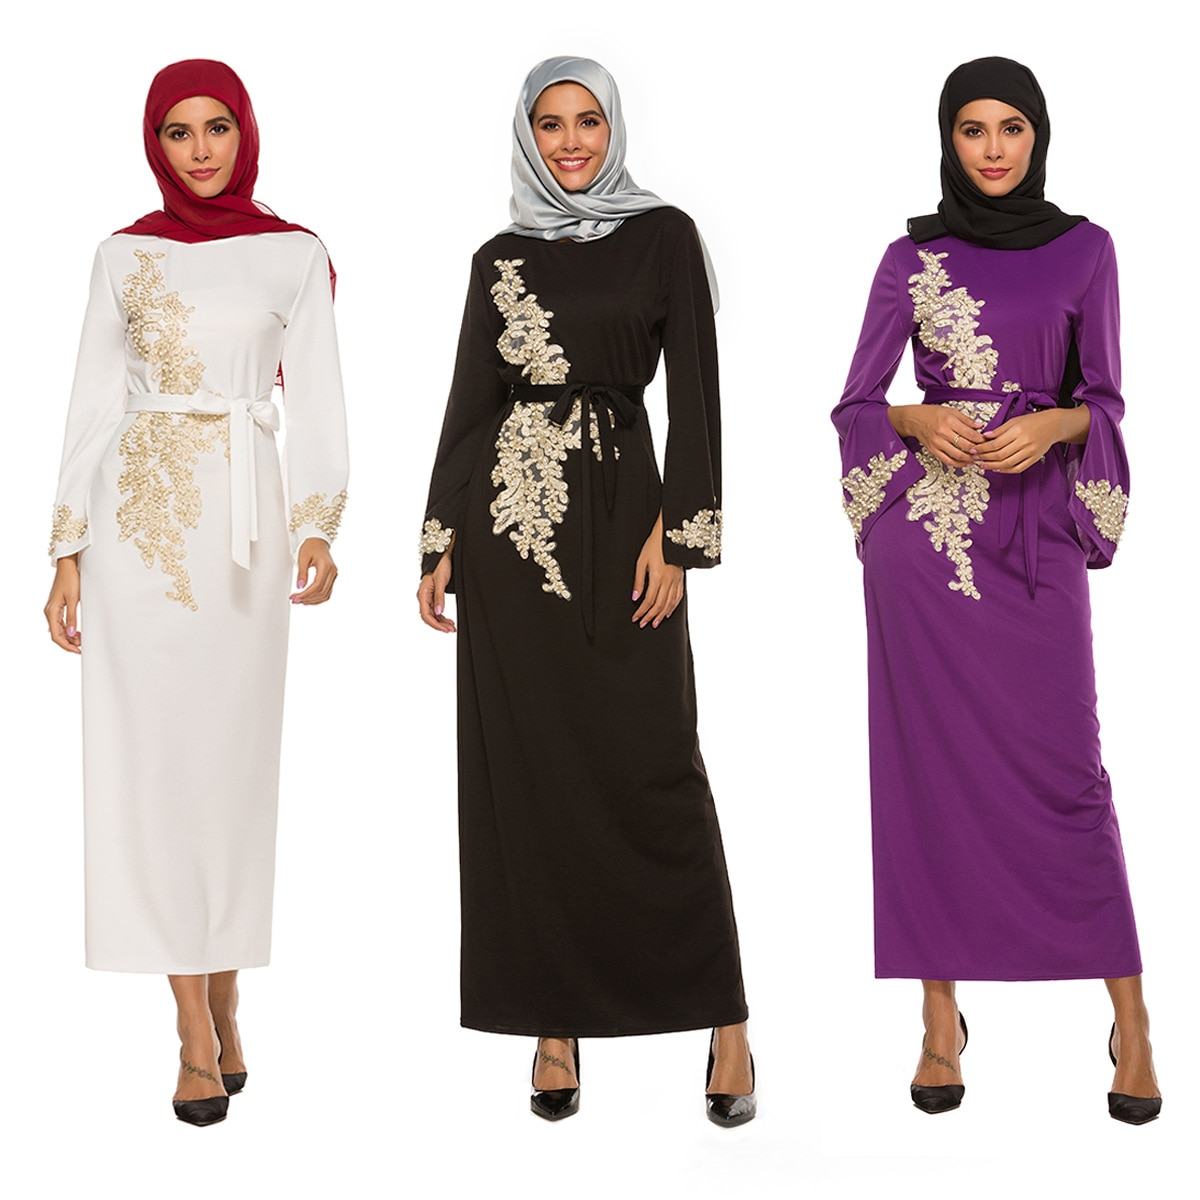 Muslim Dubai Abaya Trumpet Long Sleeve Dress Dubai Abaya Turkish Muslim Women's Dress Long Muslim Dress ribbon tape detail trumpet sleeve smock dress